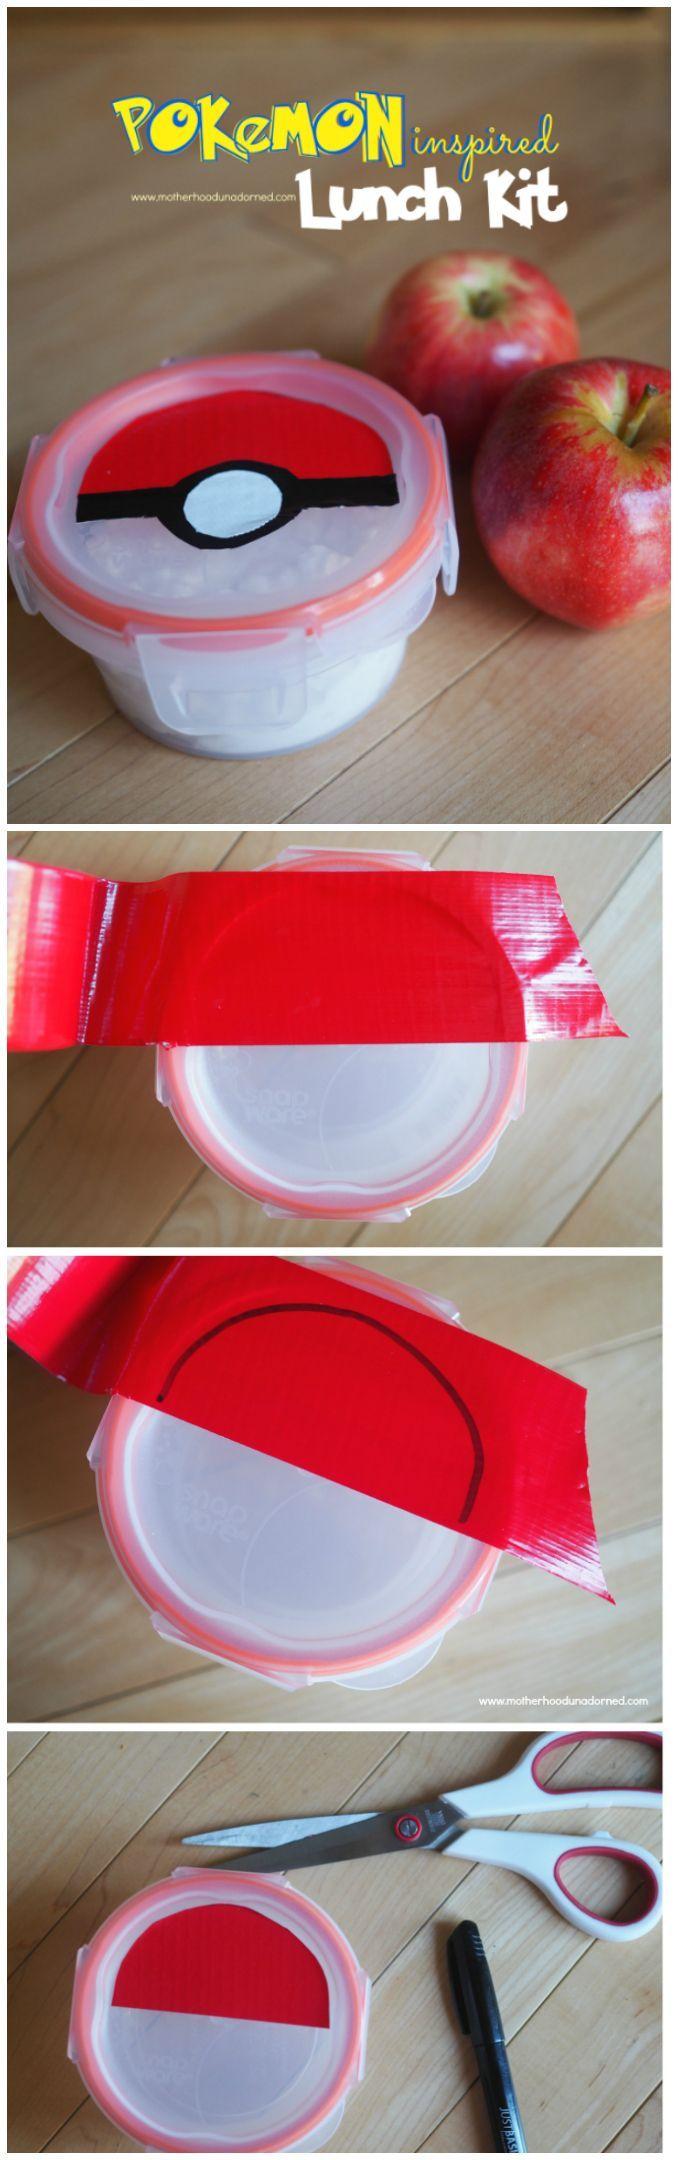 How to make your own Pokemon inspired Pokeball lunch kit for lovers of Pokemon GO! {tutorial}